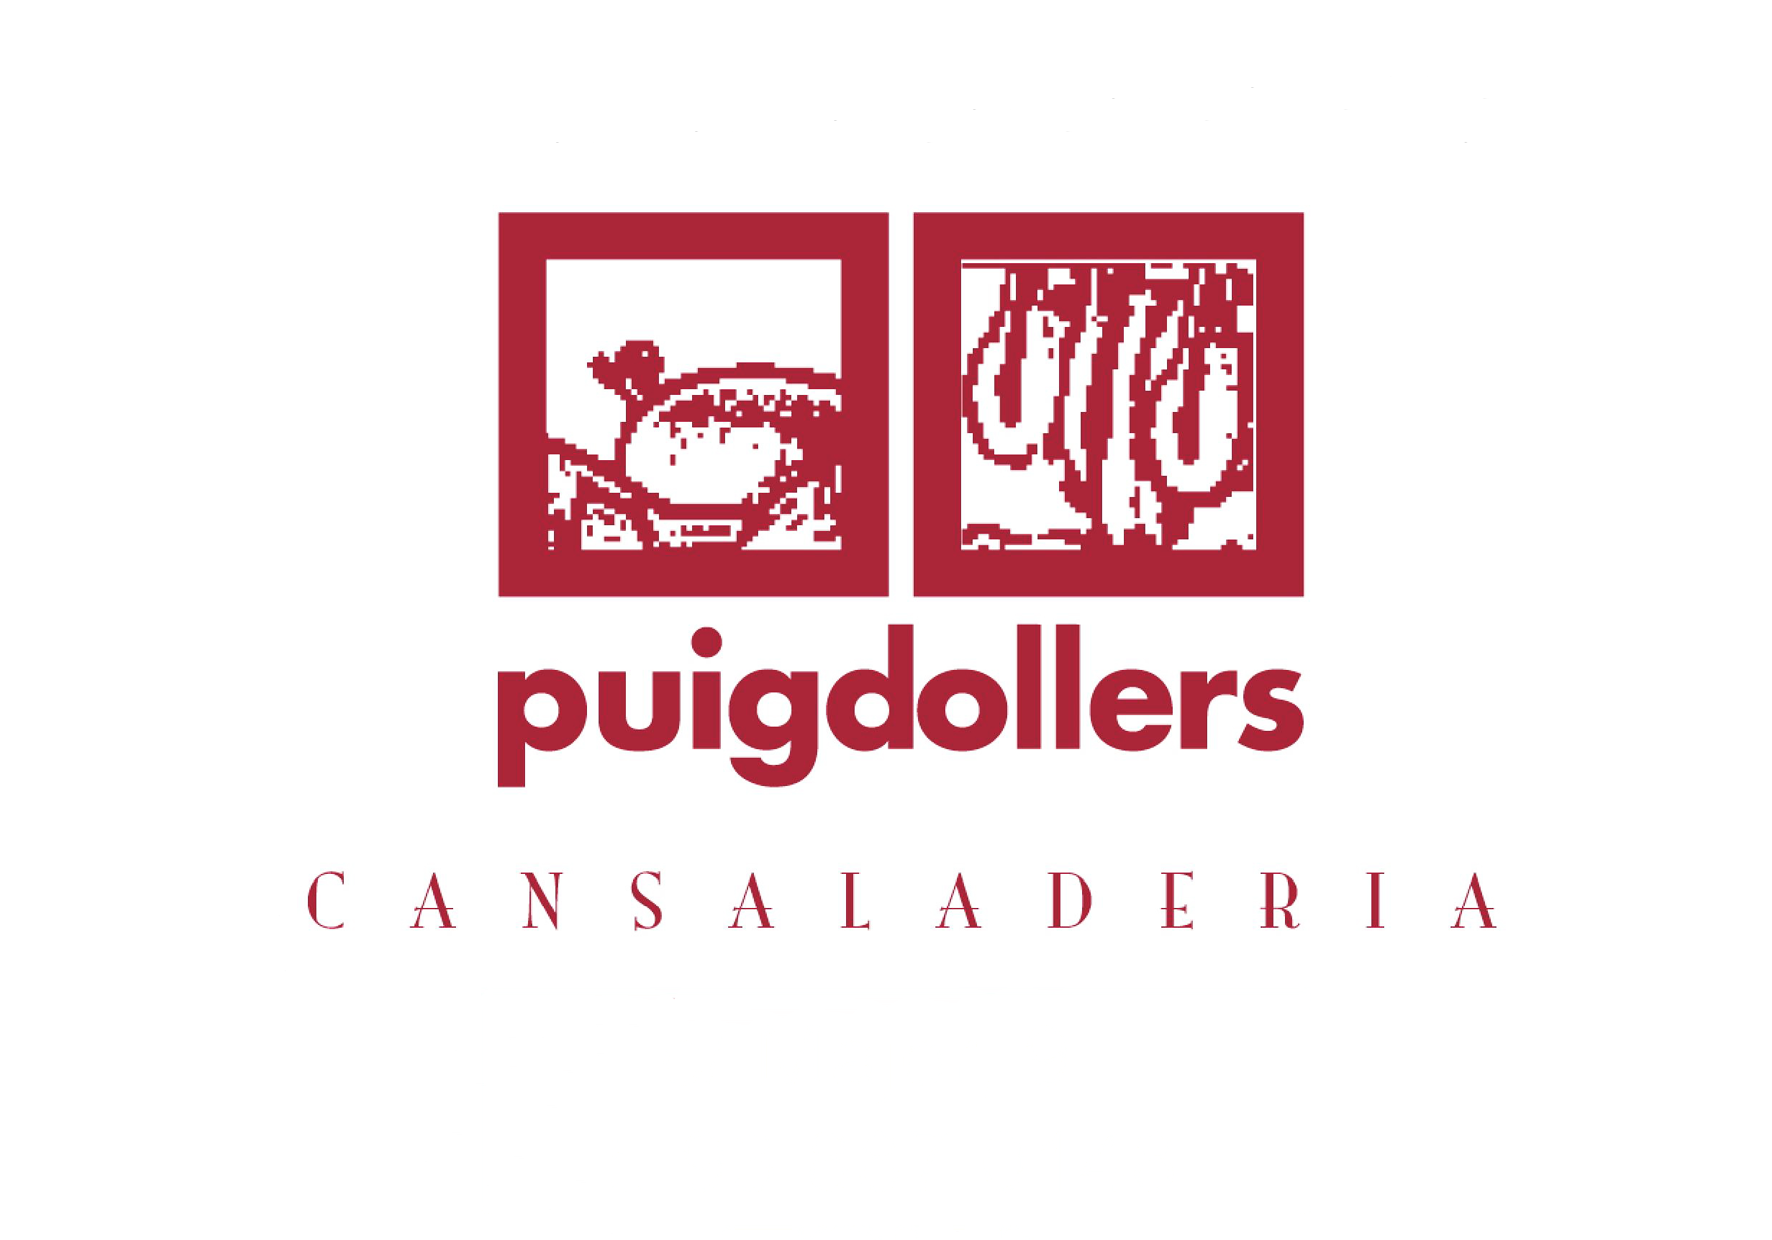 CANSALADERIA PUIGDOLLERS